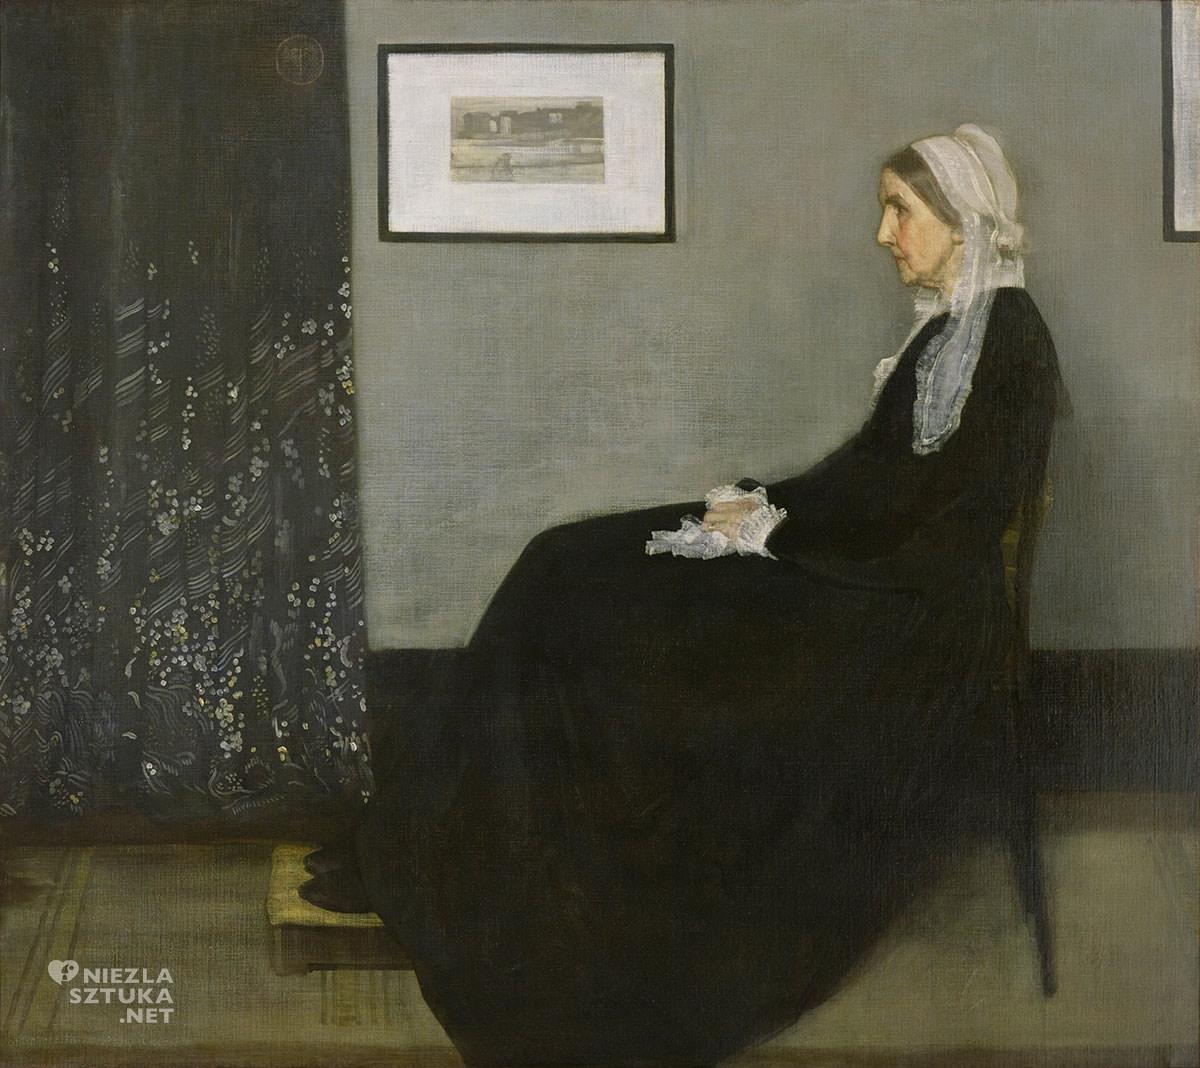 James Abbott McNeill Whistler, Matka Whistlera, Musée d'Orsay, Niezła sztuka